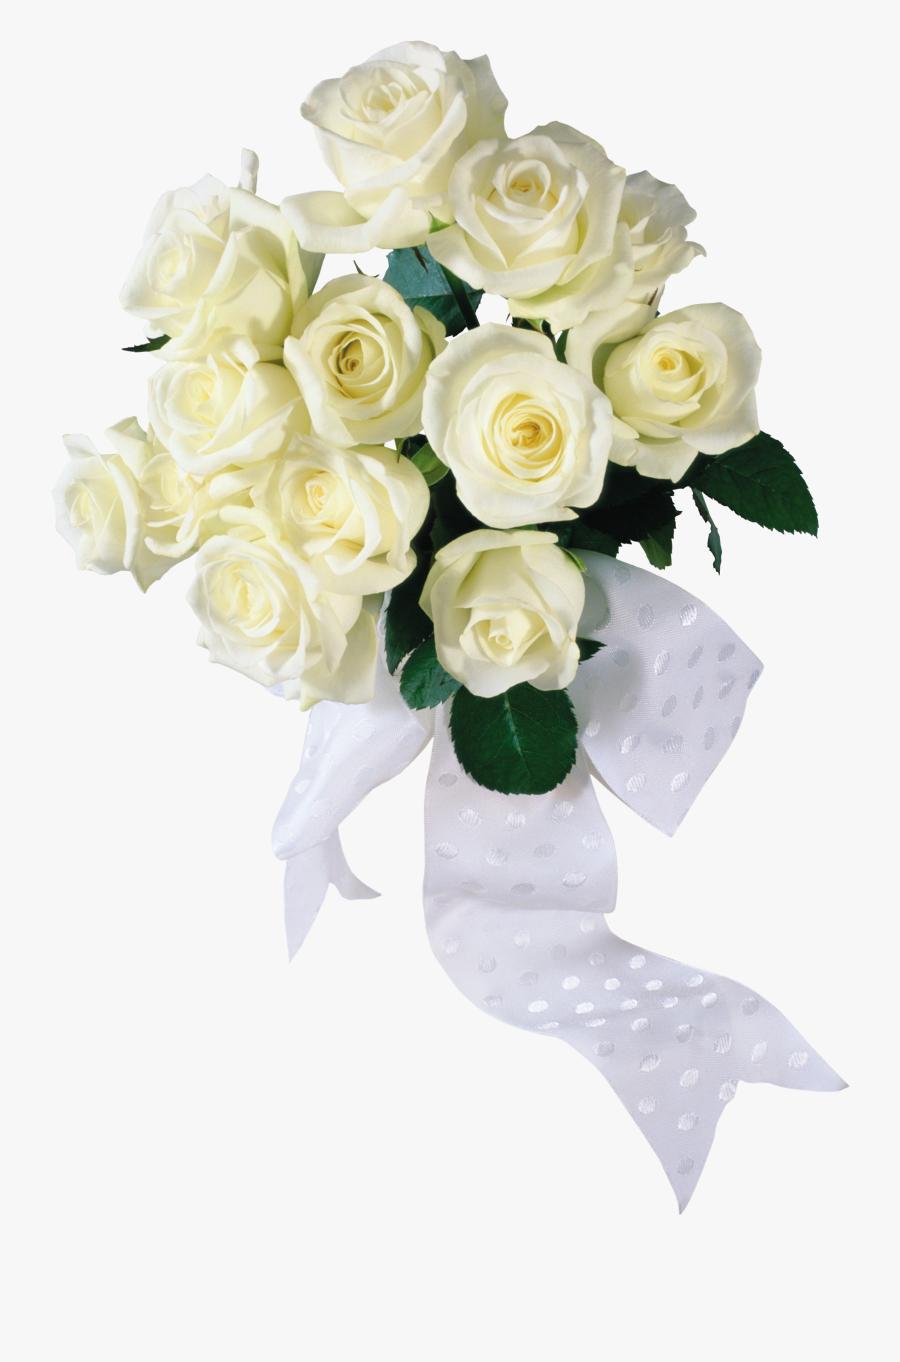 White Roses Png Images, Free Download Flower Pixtures - Wedding Flower Bouquet Png, Transparent Clipart